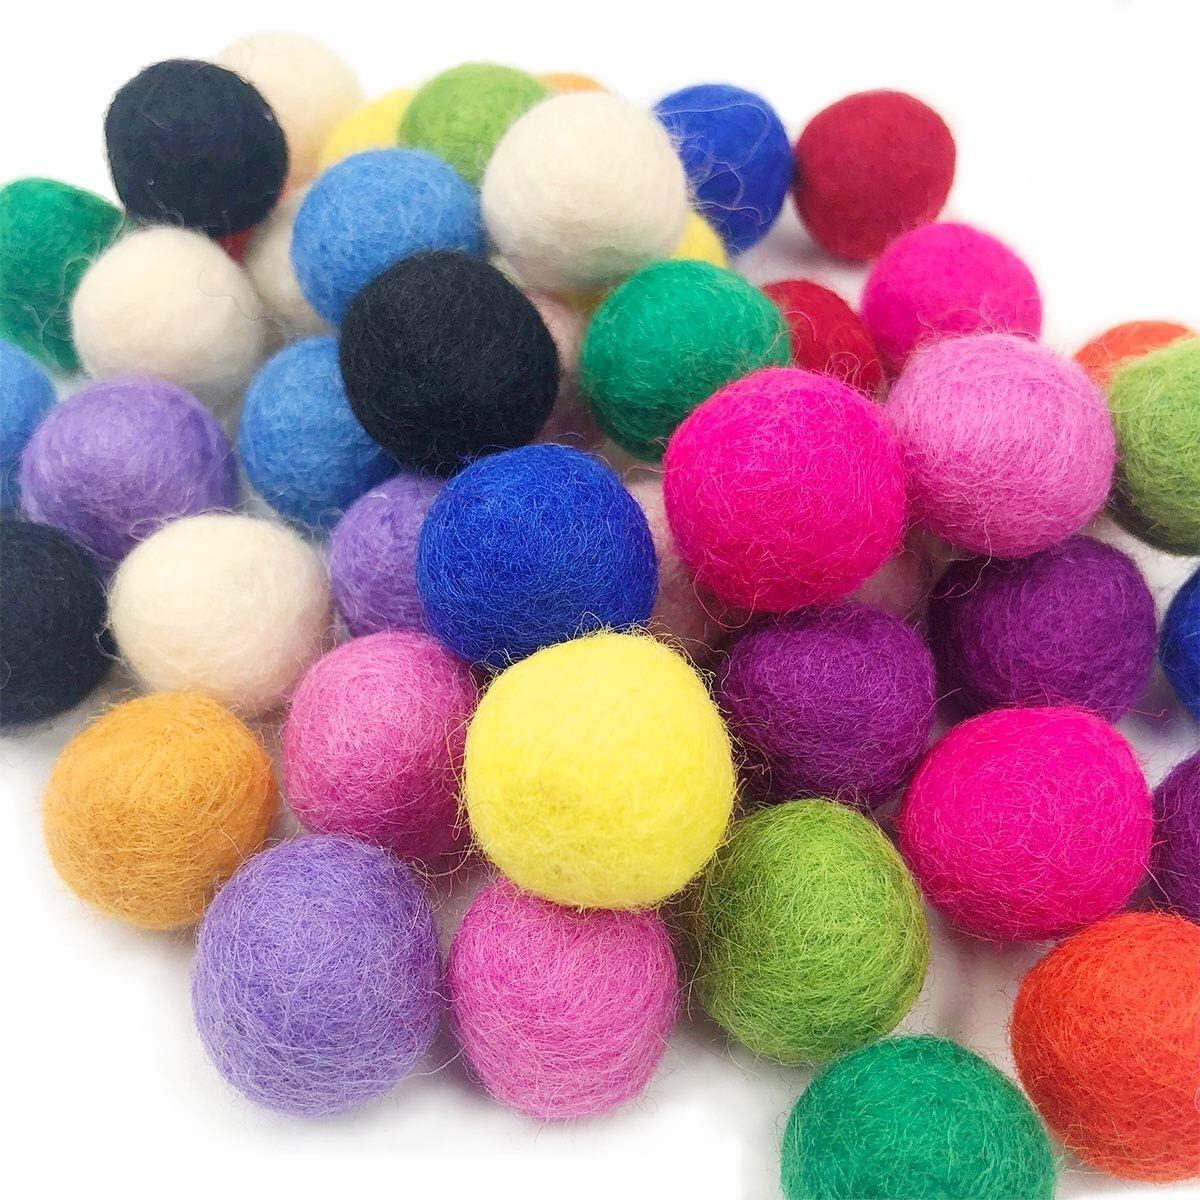 Felt Balls Handmade Felt Balls craft supplies felt beads  Nursery decor Wool Felt Balls Felted Balls Pom Poms 2 cm Felt Ball Garland